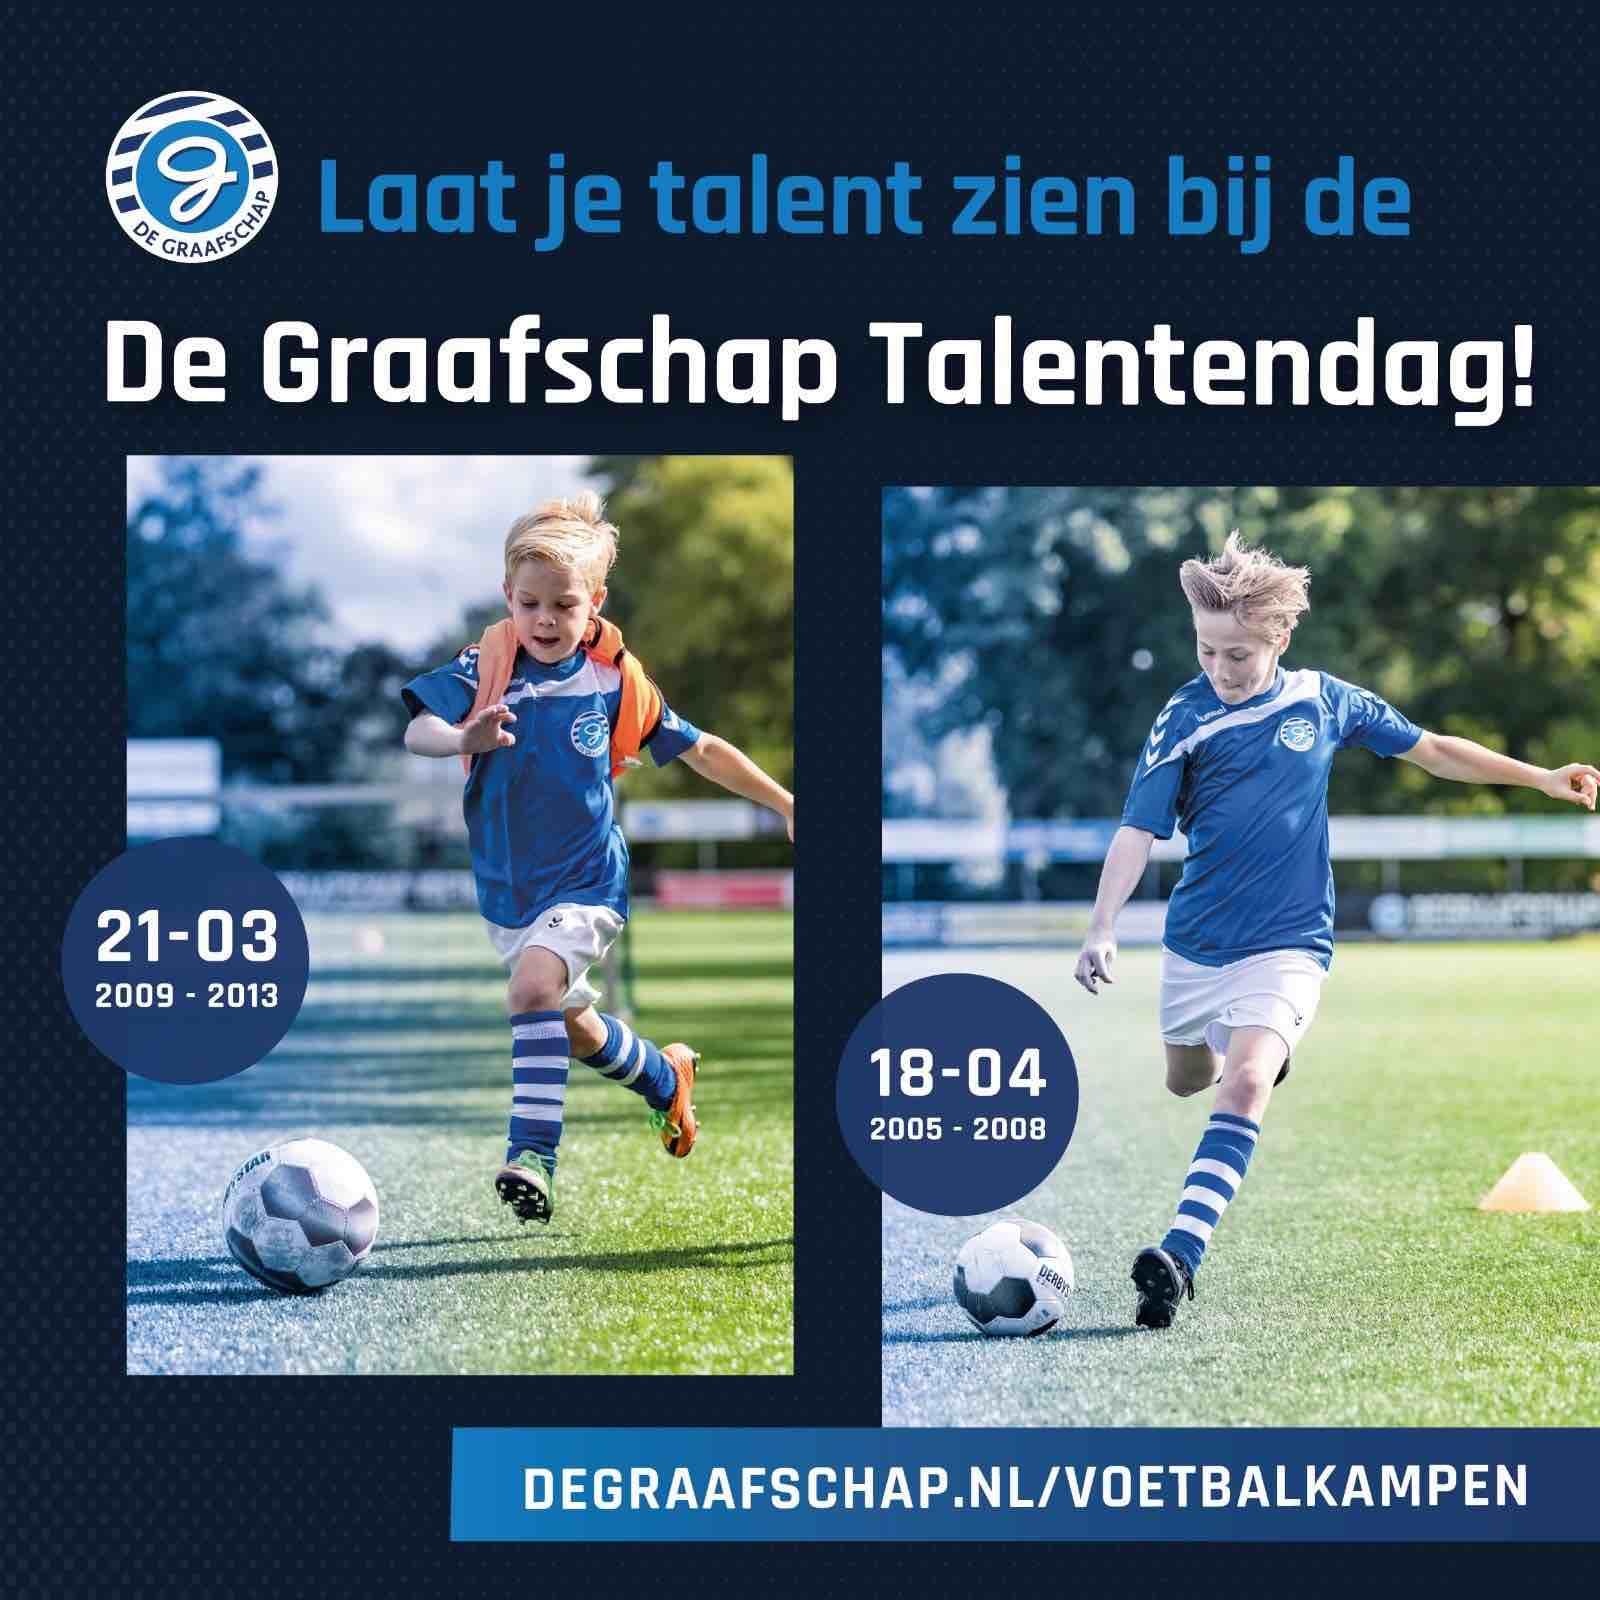 De Graafschap Talentendag